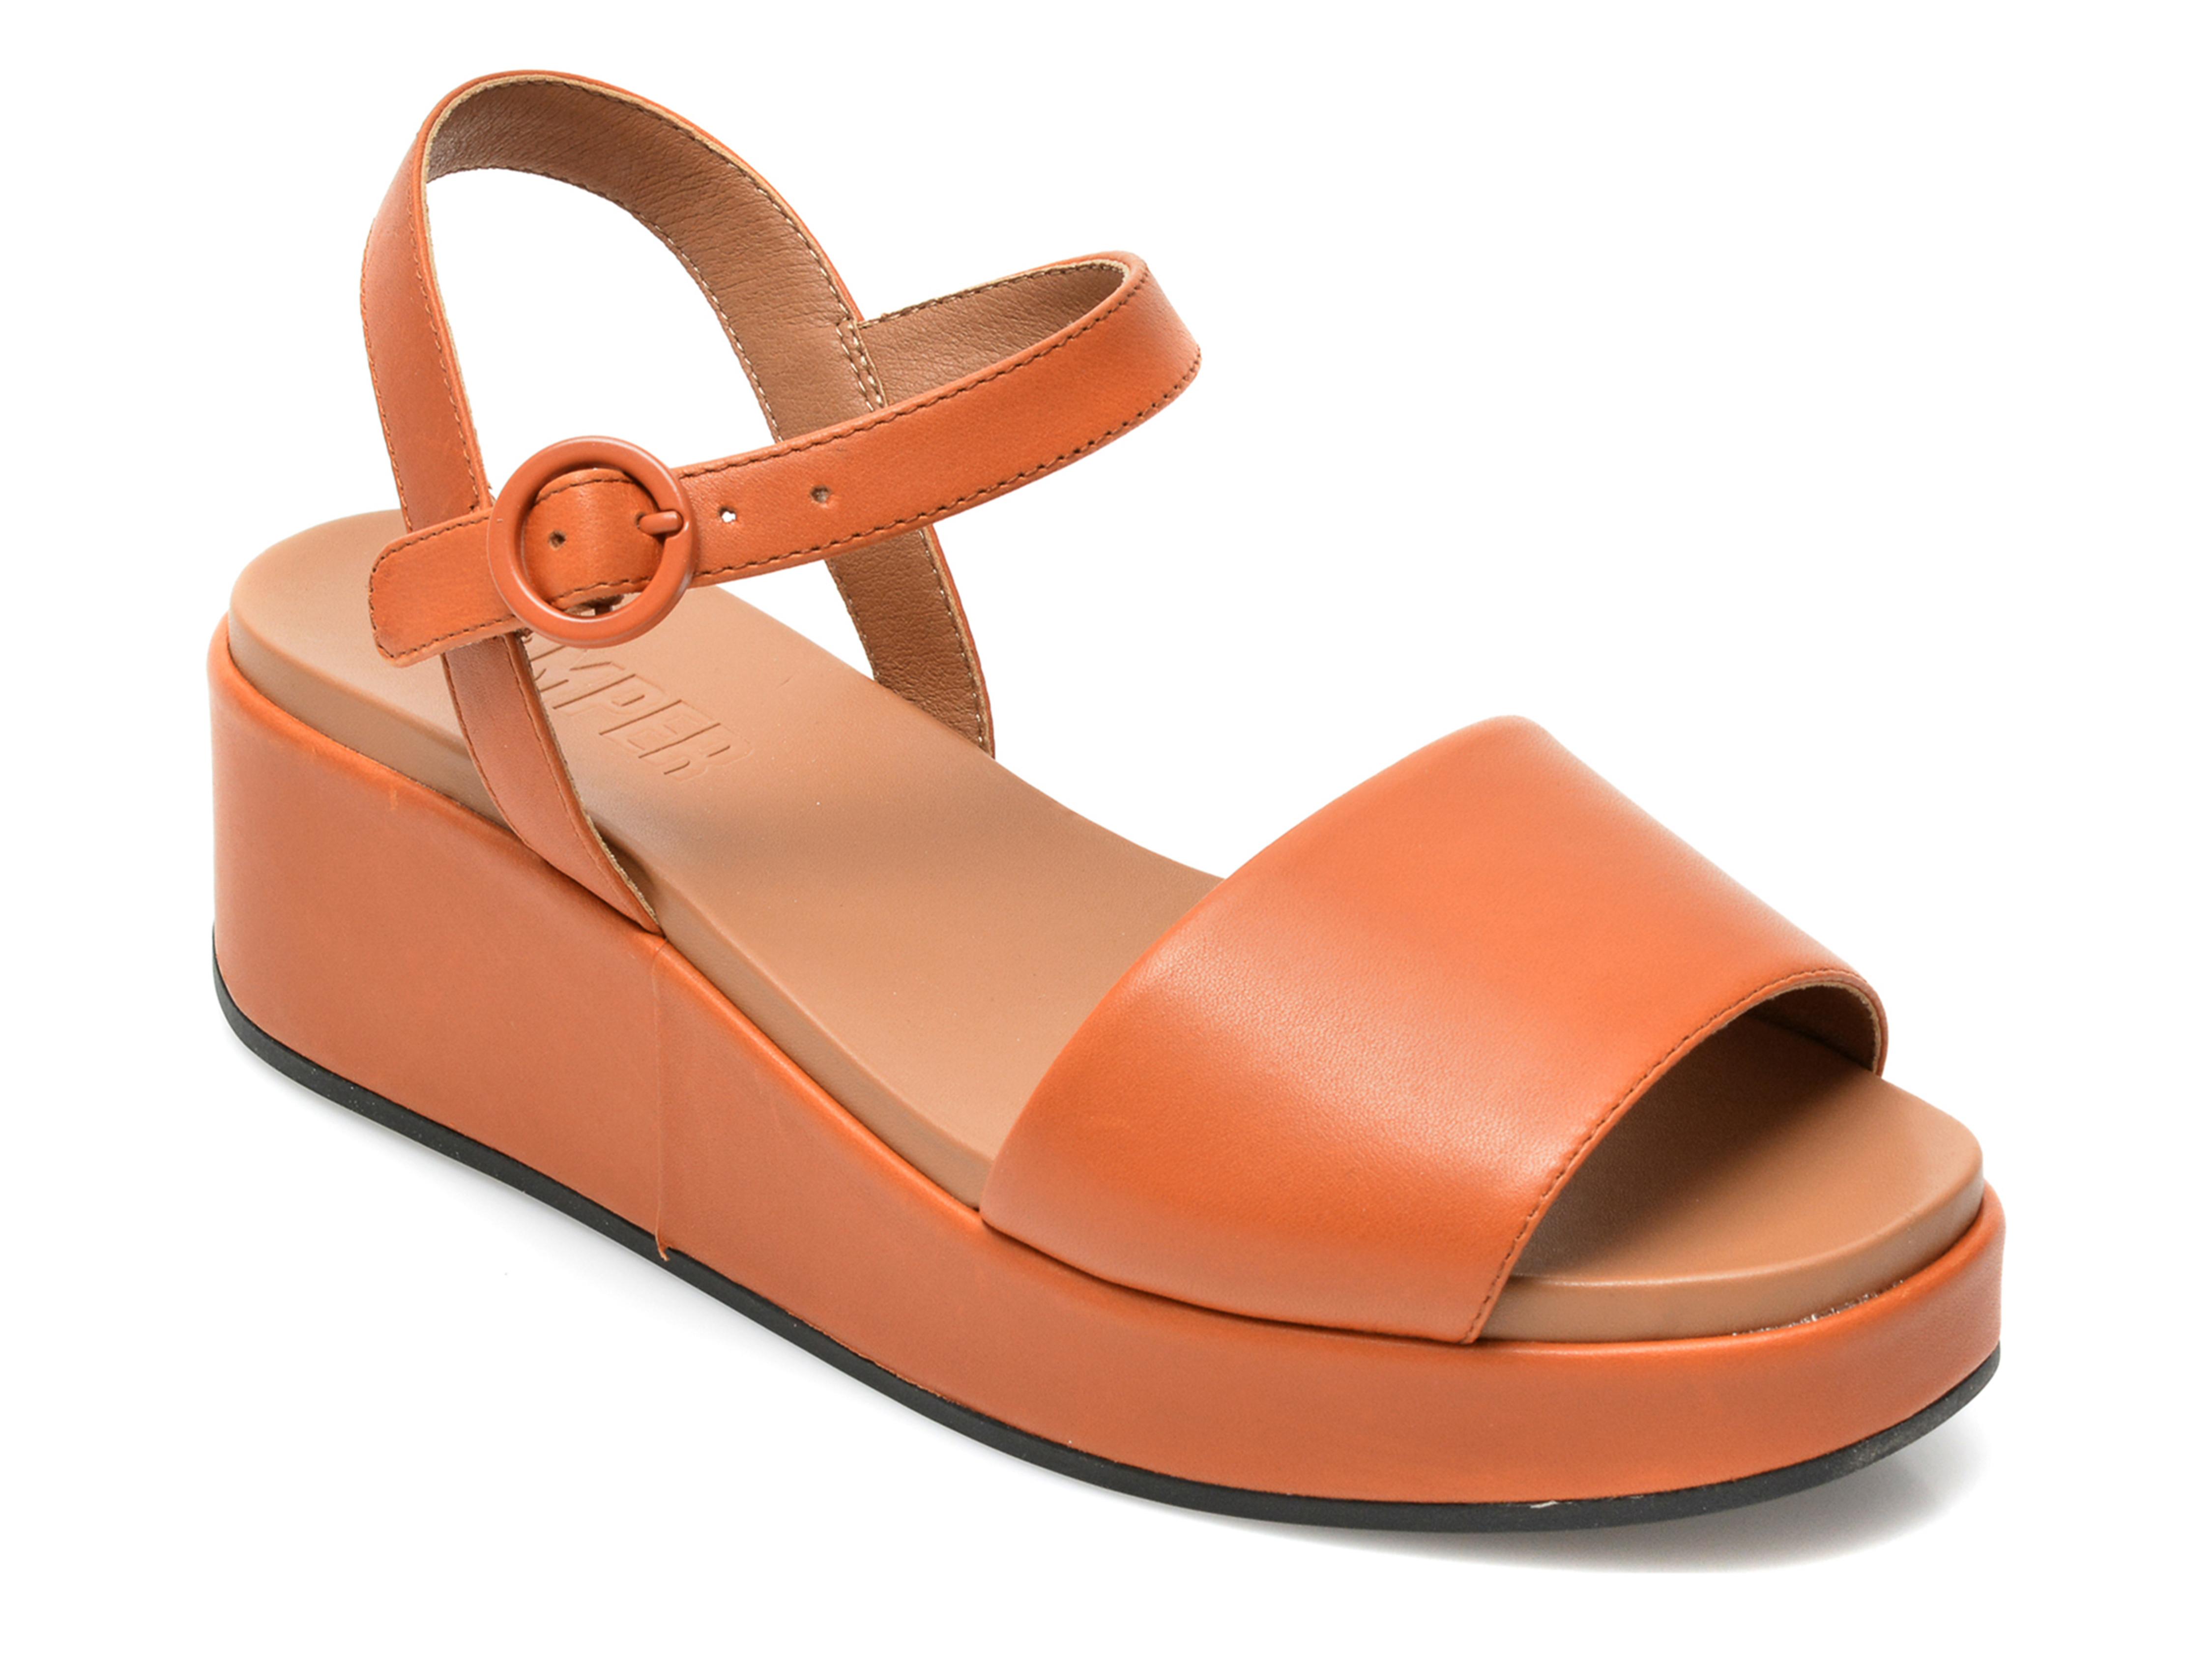 Sandale CAMPER maro, K200564, din piele naturala imagine otter.ro